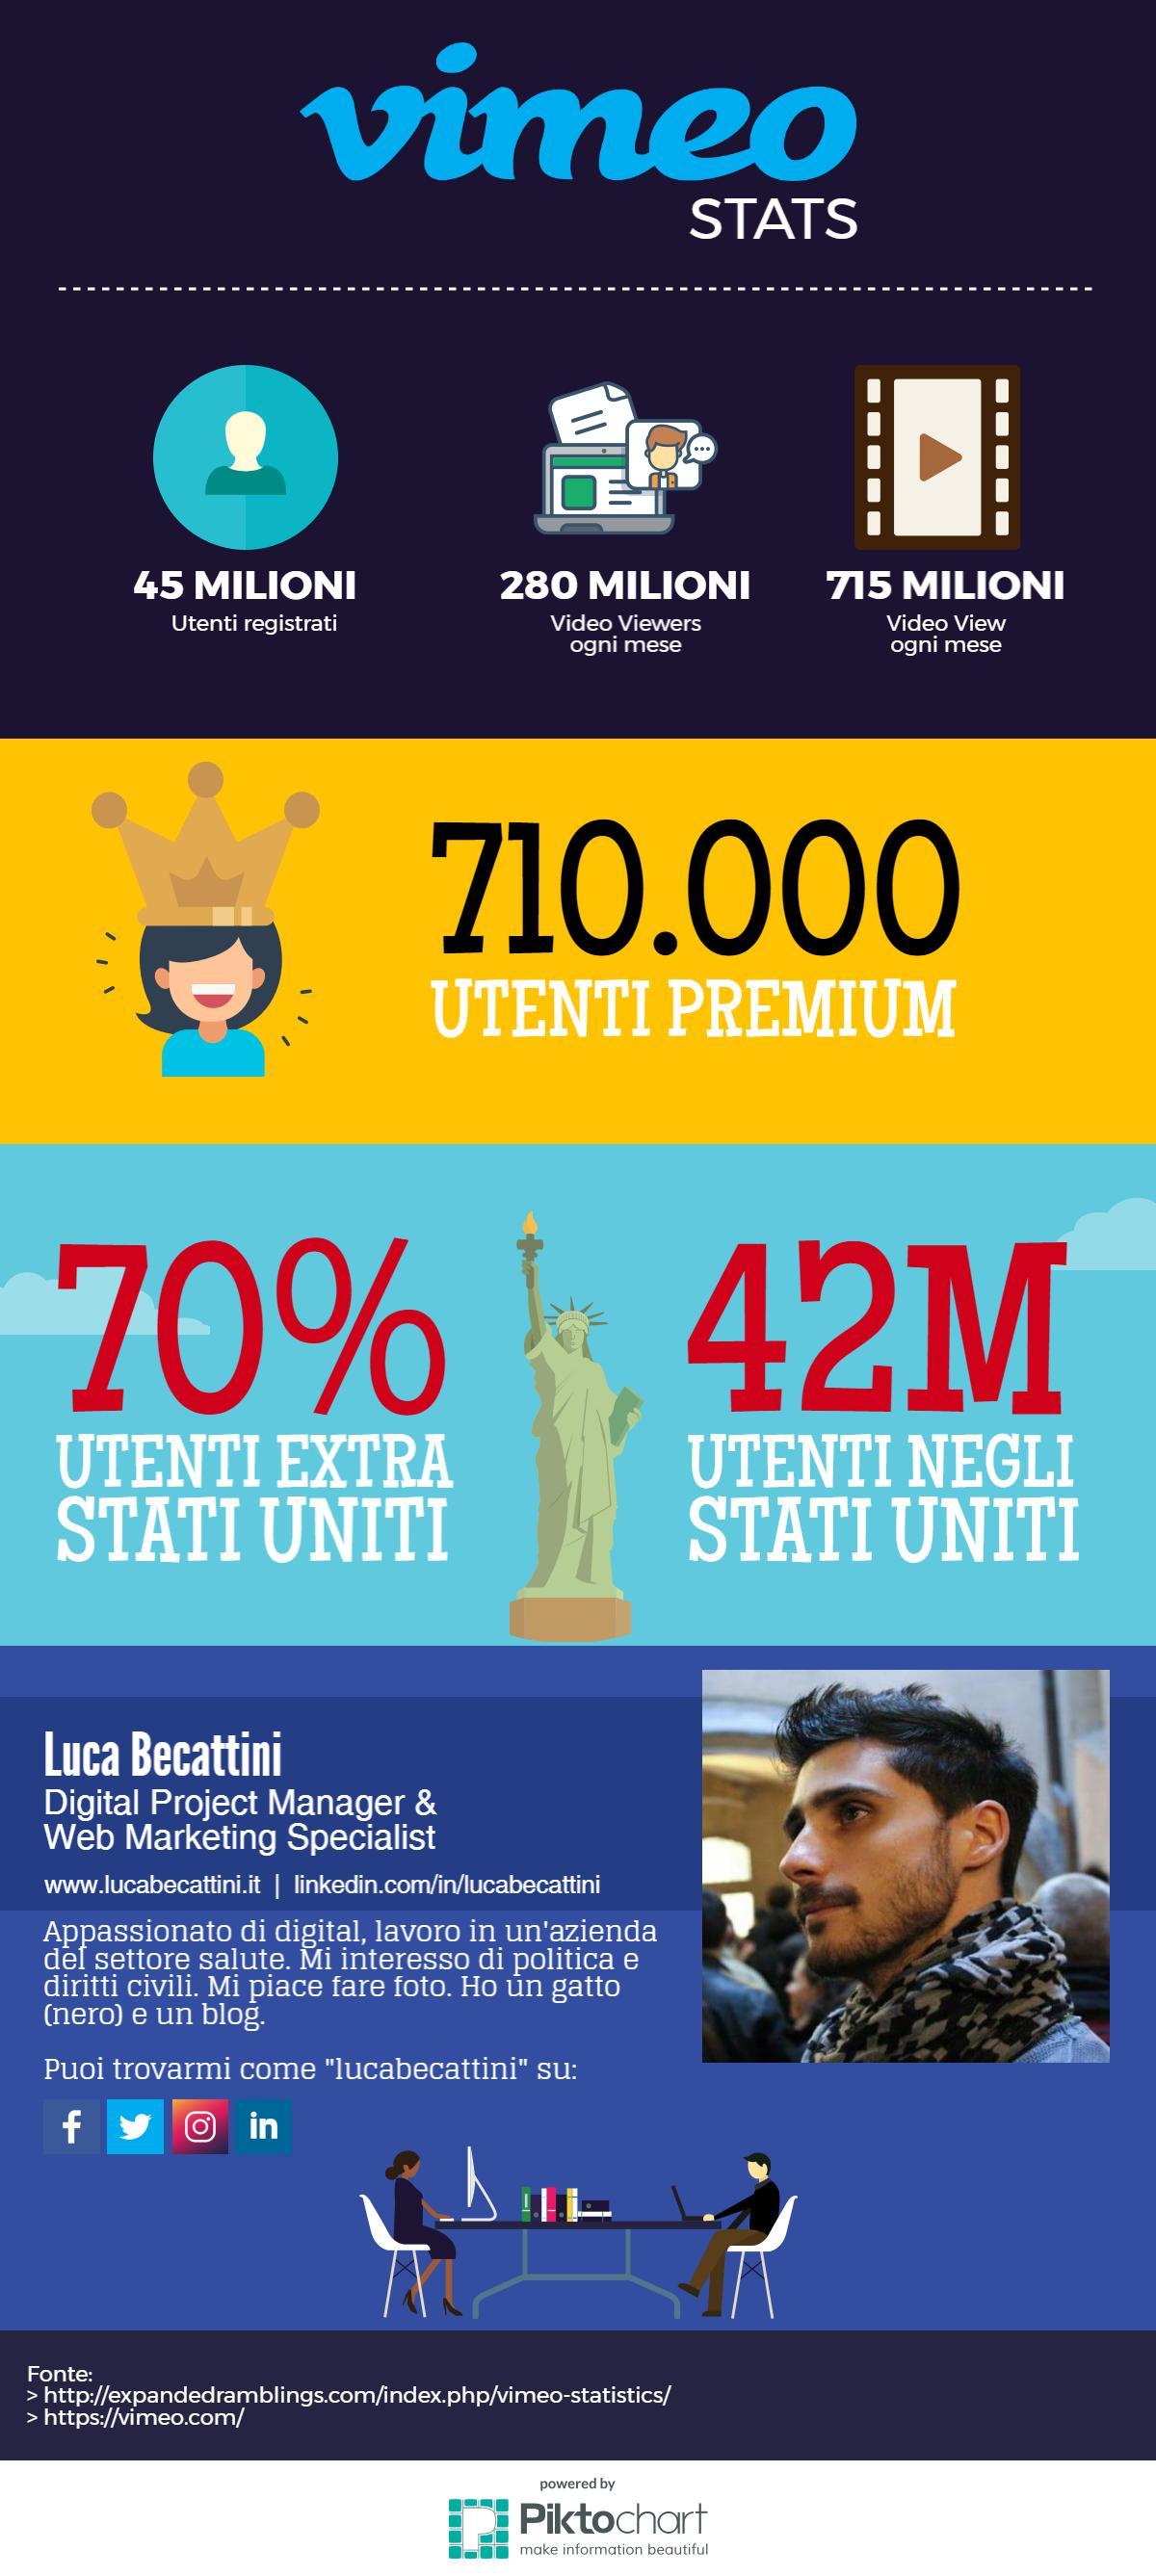 vimeo-stats-infographic